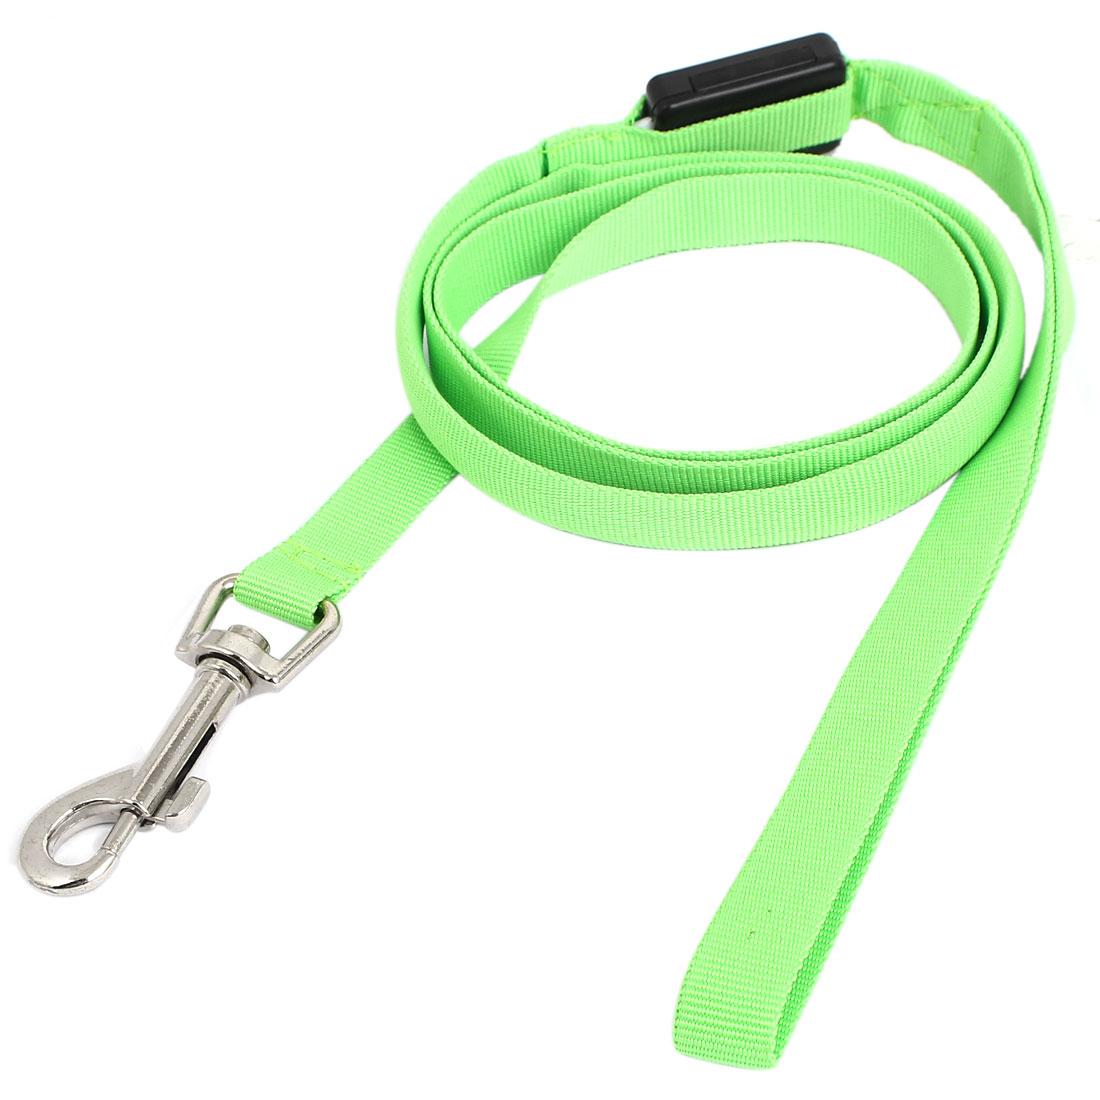 Pet Cat Dog Green Lighting Nylon Leash Harmess Lead Strap Rope 120cm Long